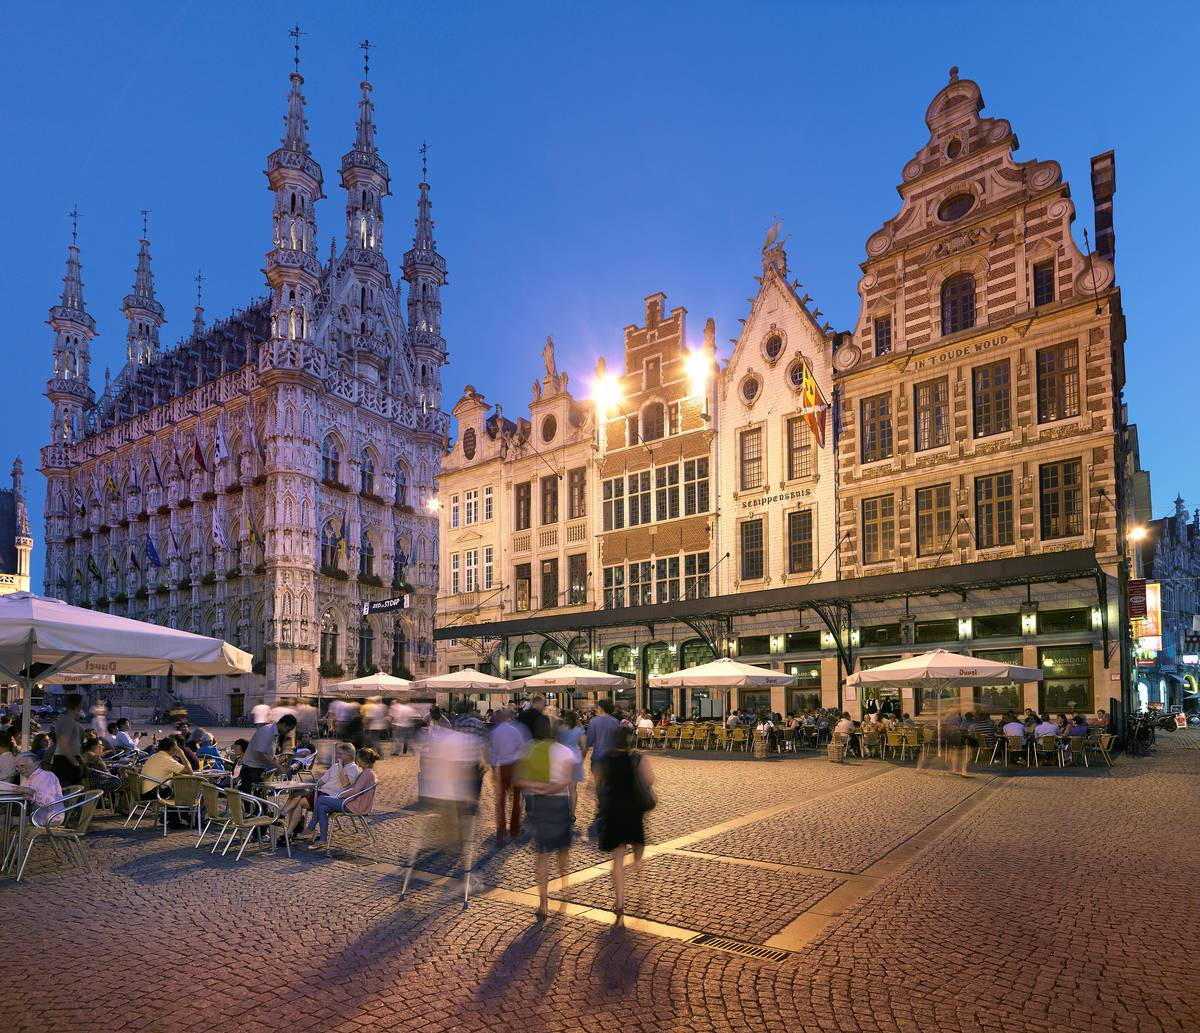 Das Rathaus von Leuven (c) Milo Profi /visitflanders